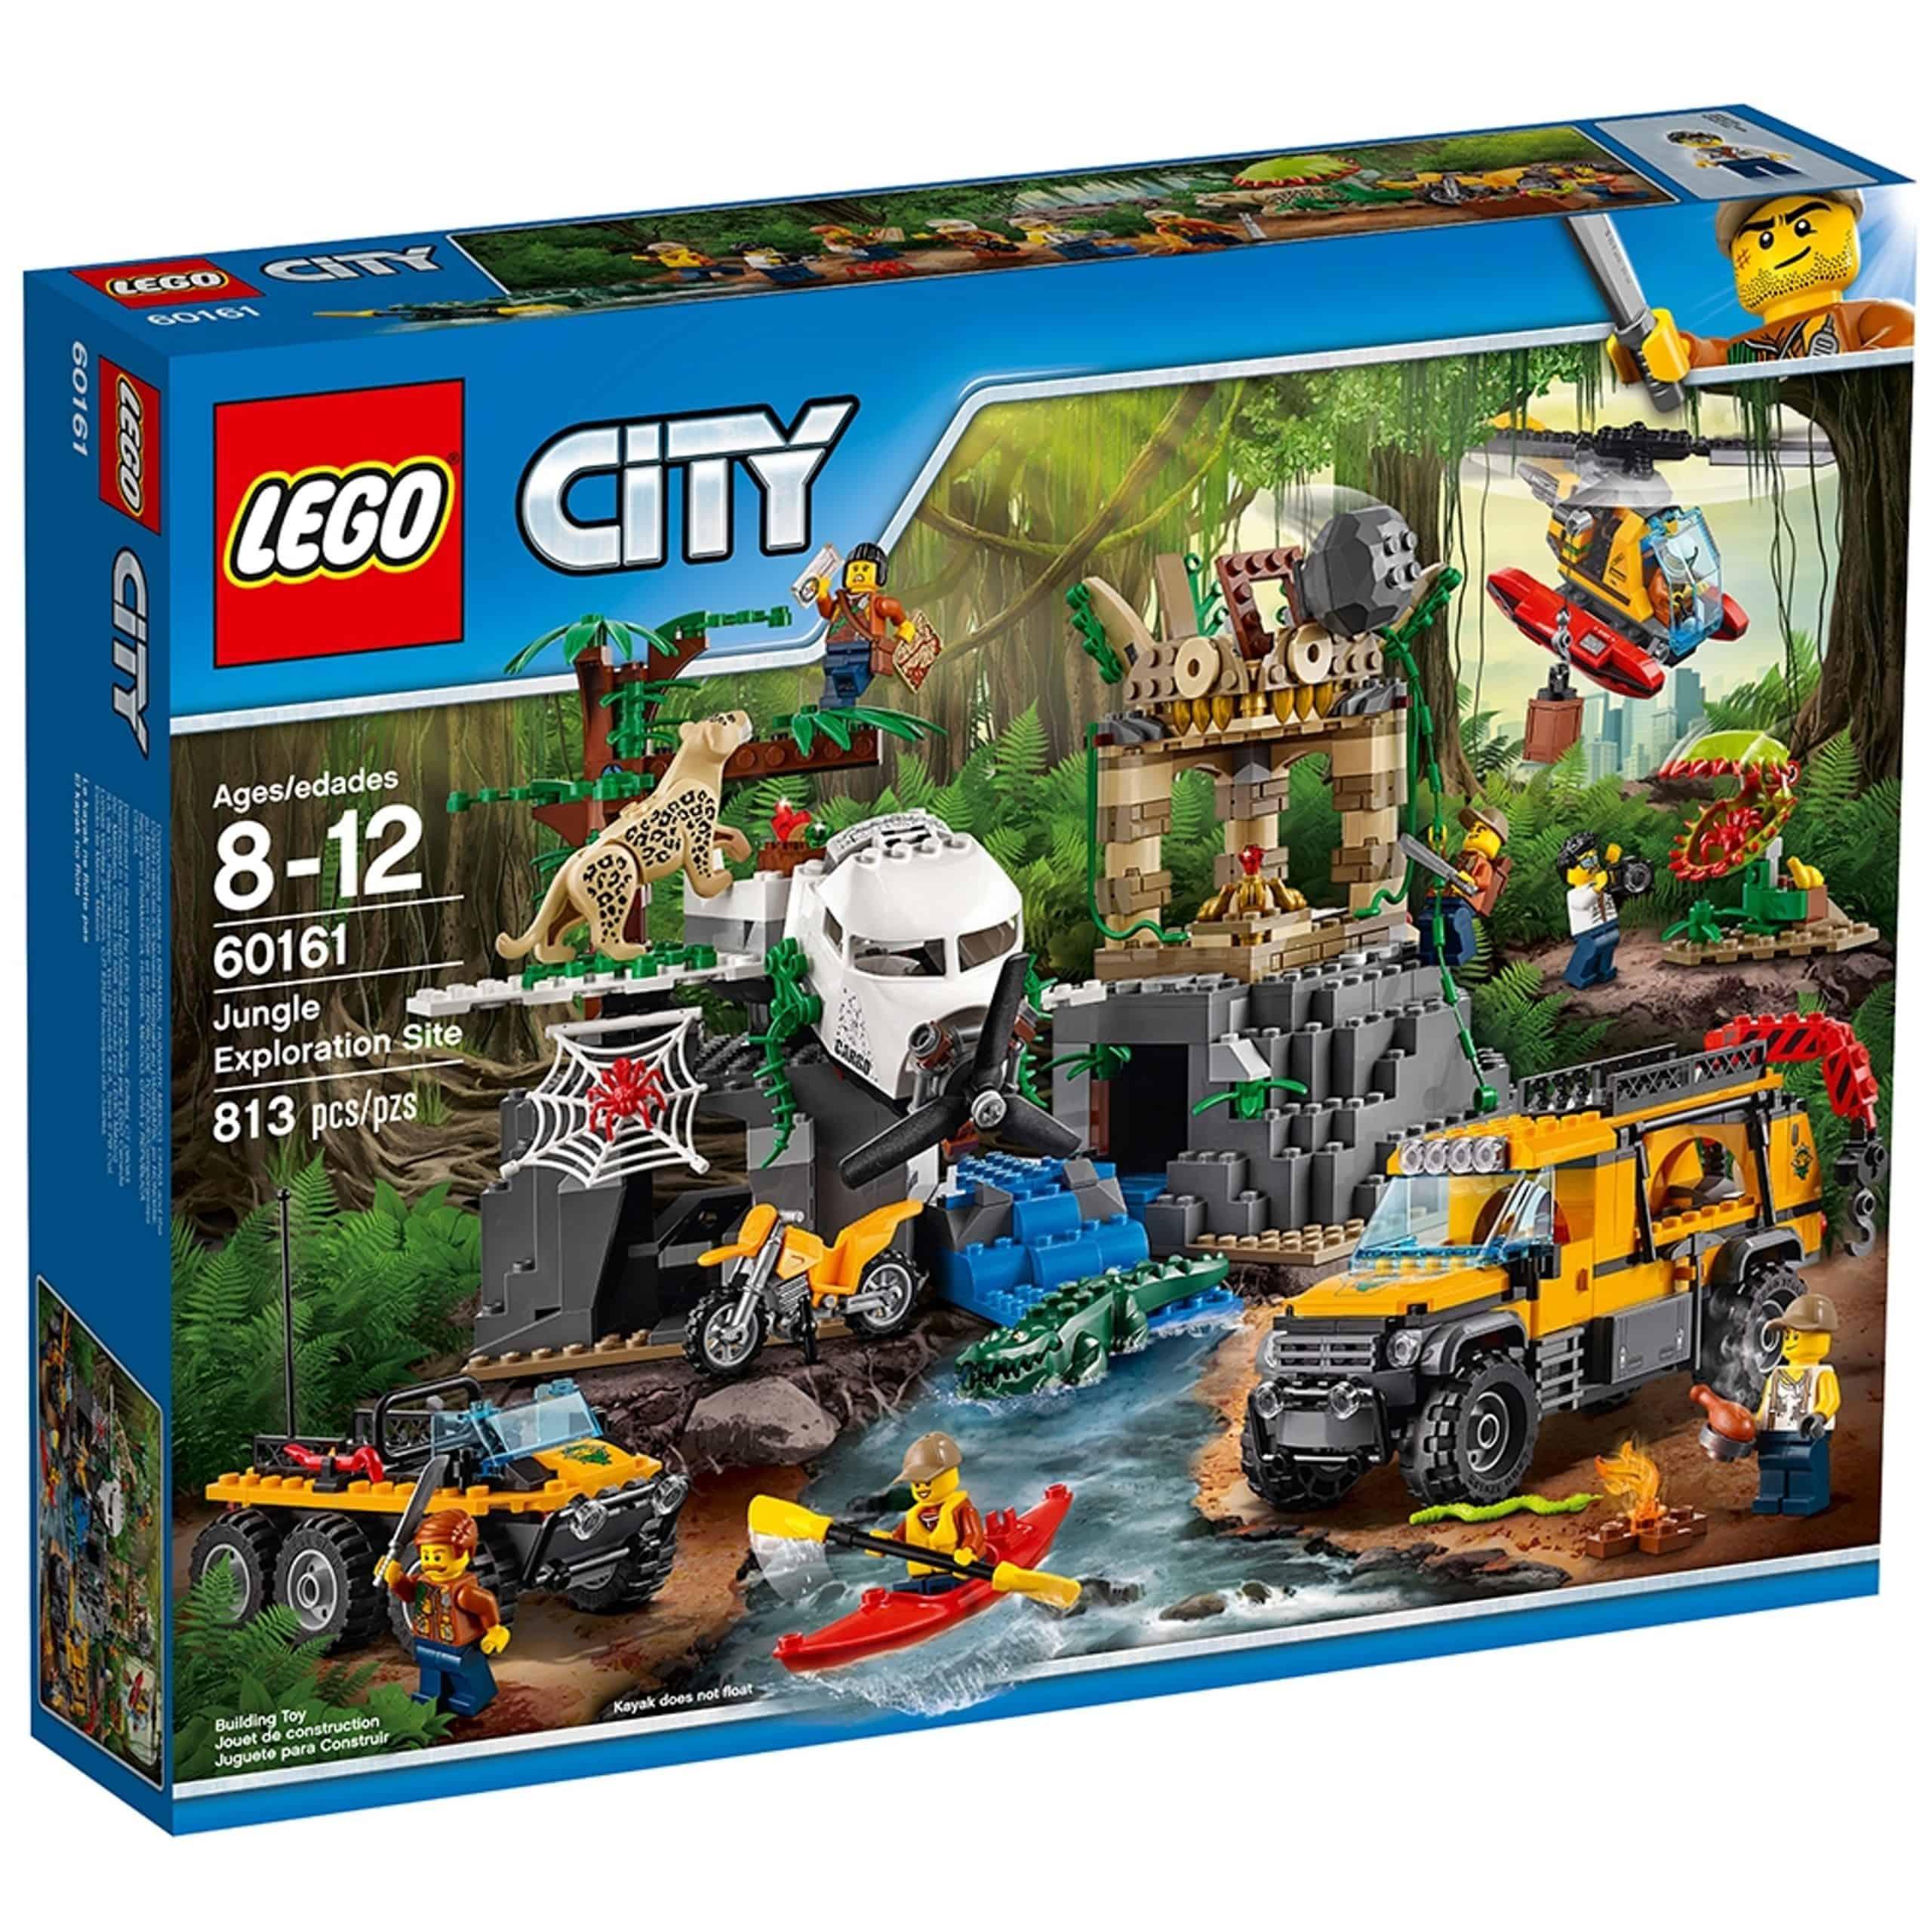 lego 60161 le site dexploration de la jungle scaled